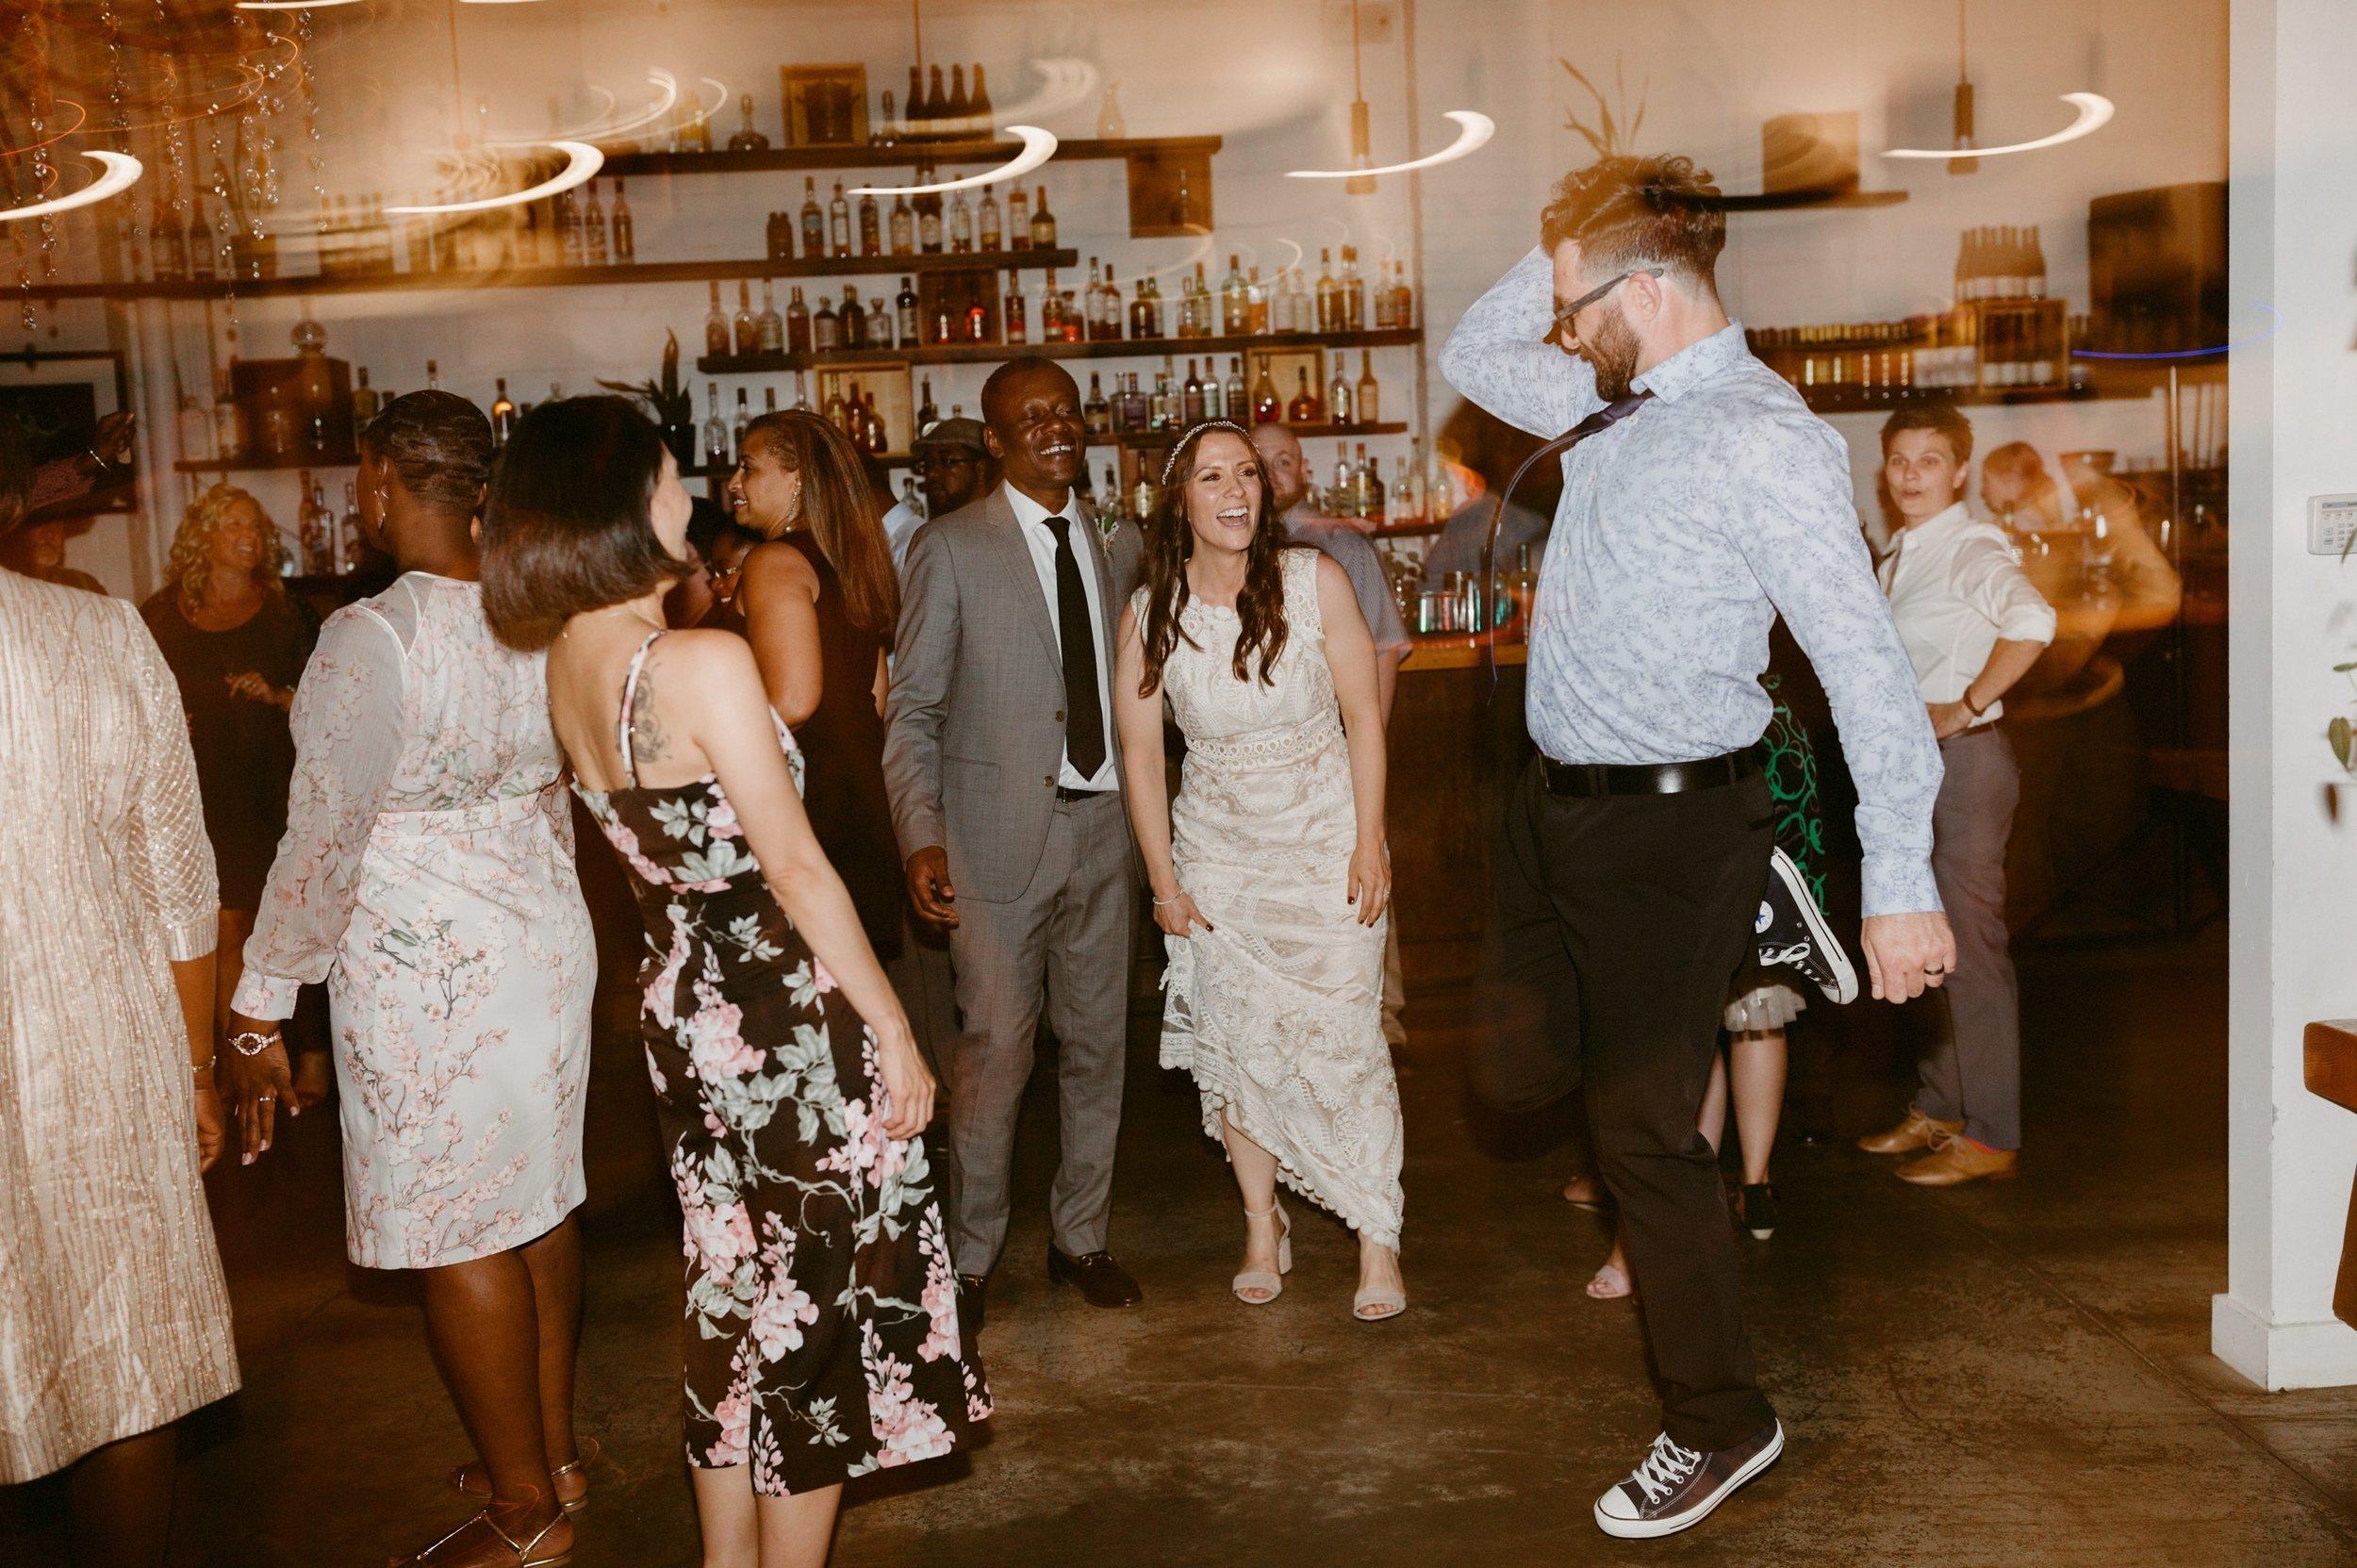 124_Spadina House Wedding (724 of 748)_intimate_Boehmer_Restaurant_Toronto_Wedding.jpg